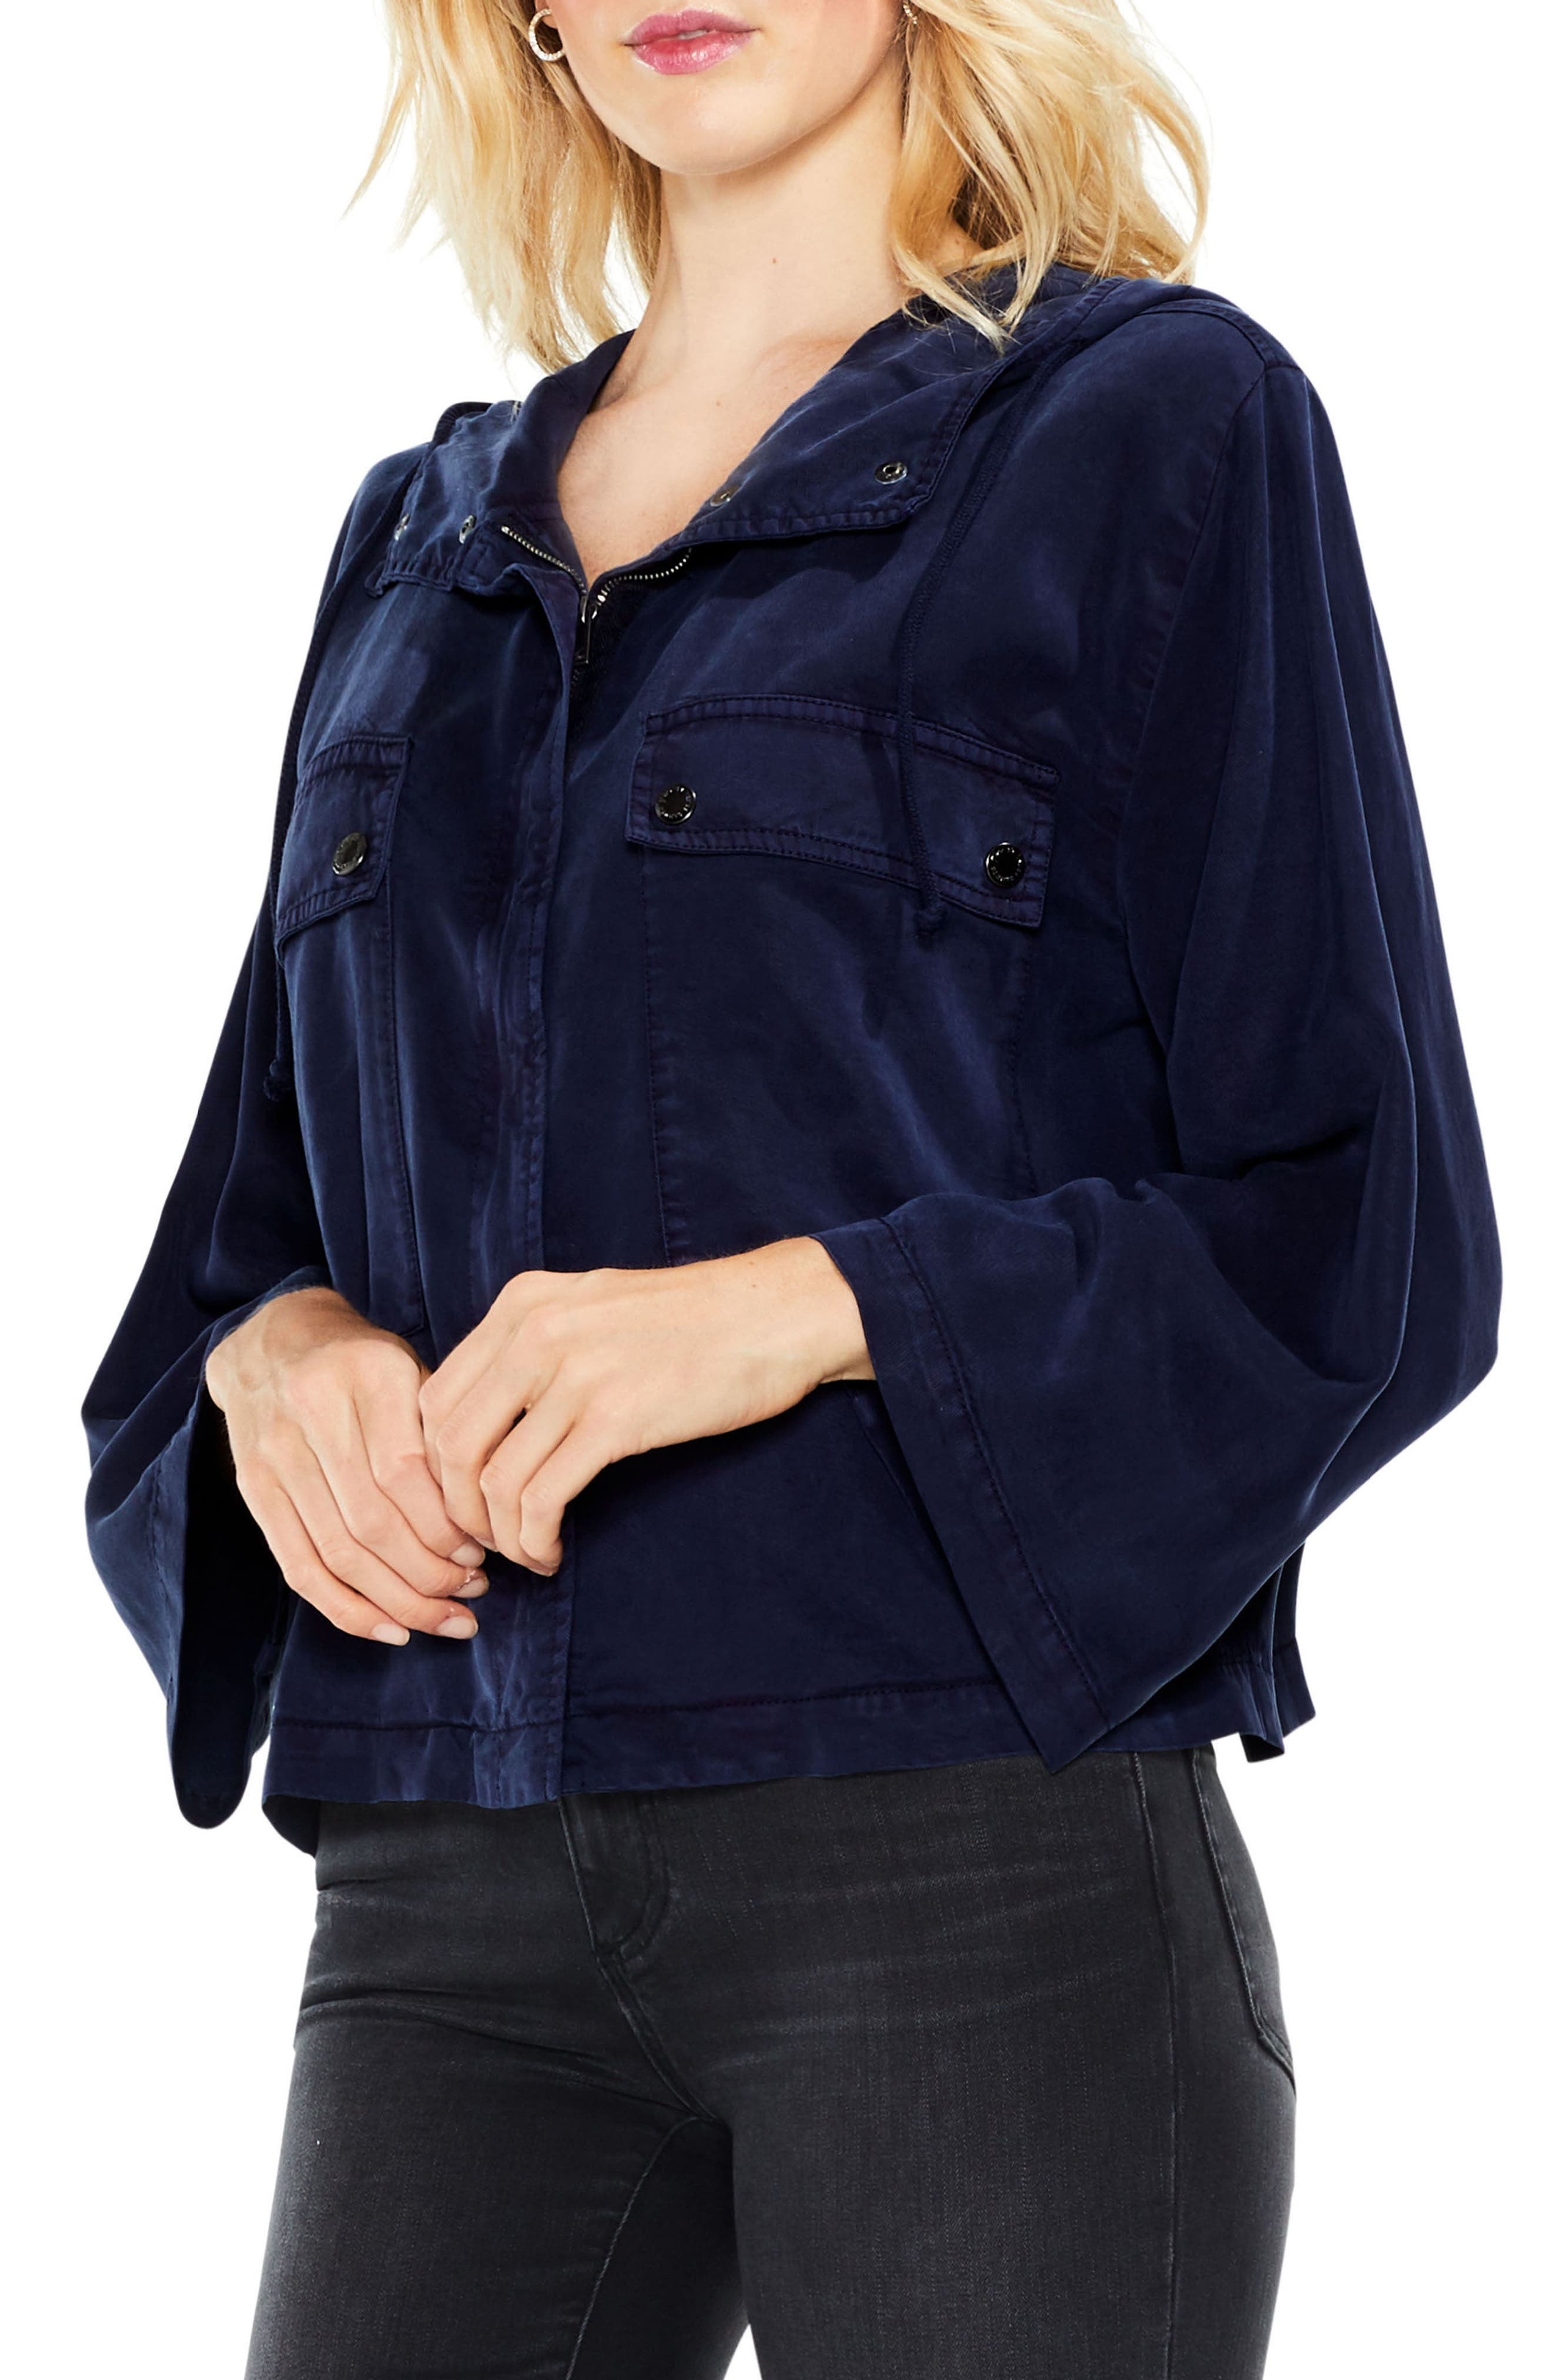 Bell Sleeve Hooded Jacket,                             Alternate thumbnail 2, color,                             461